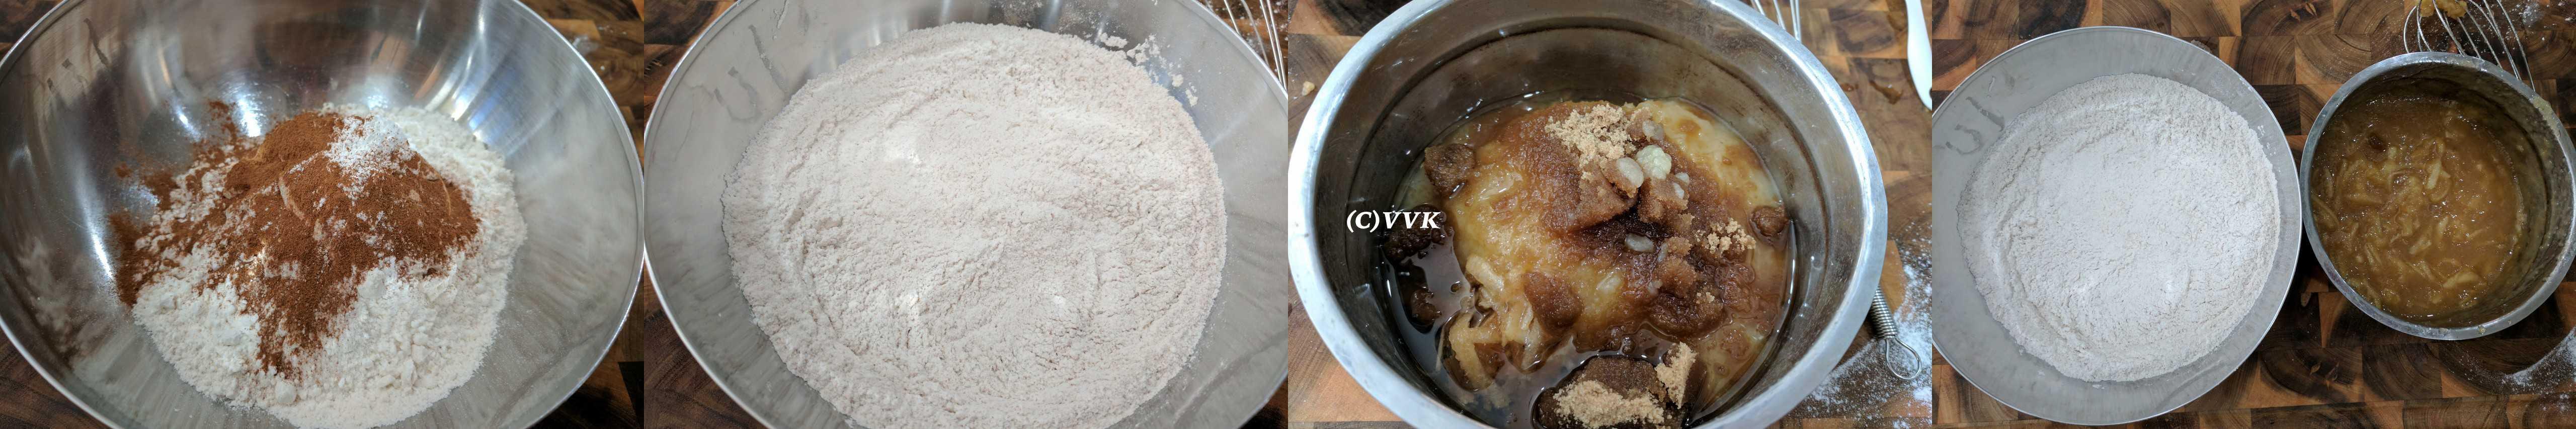 Combining the sieved flour, baking powder, cinnamon and salt.